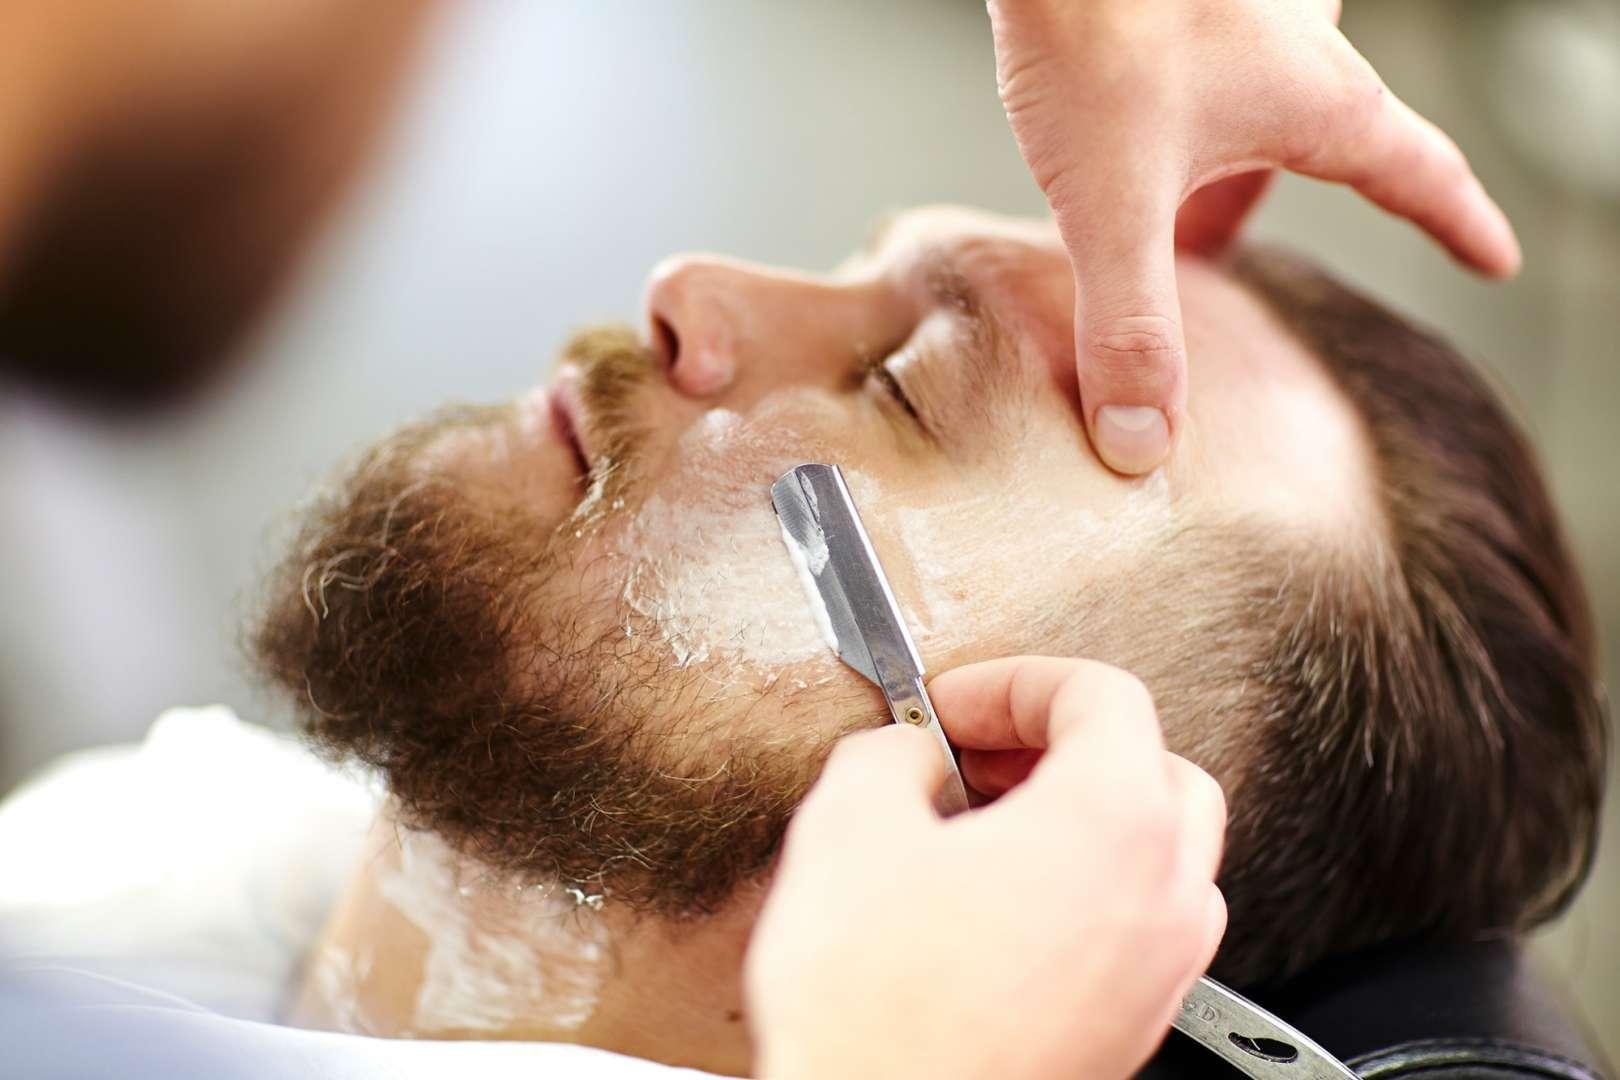 Working with razor